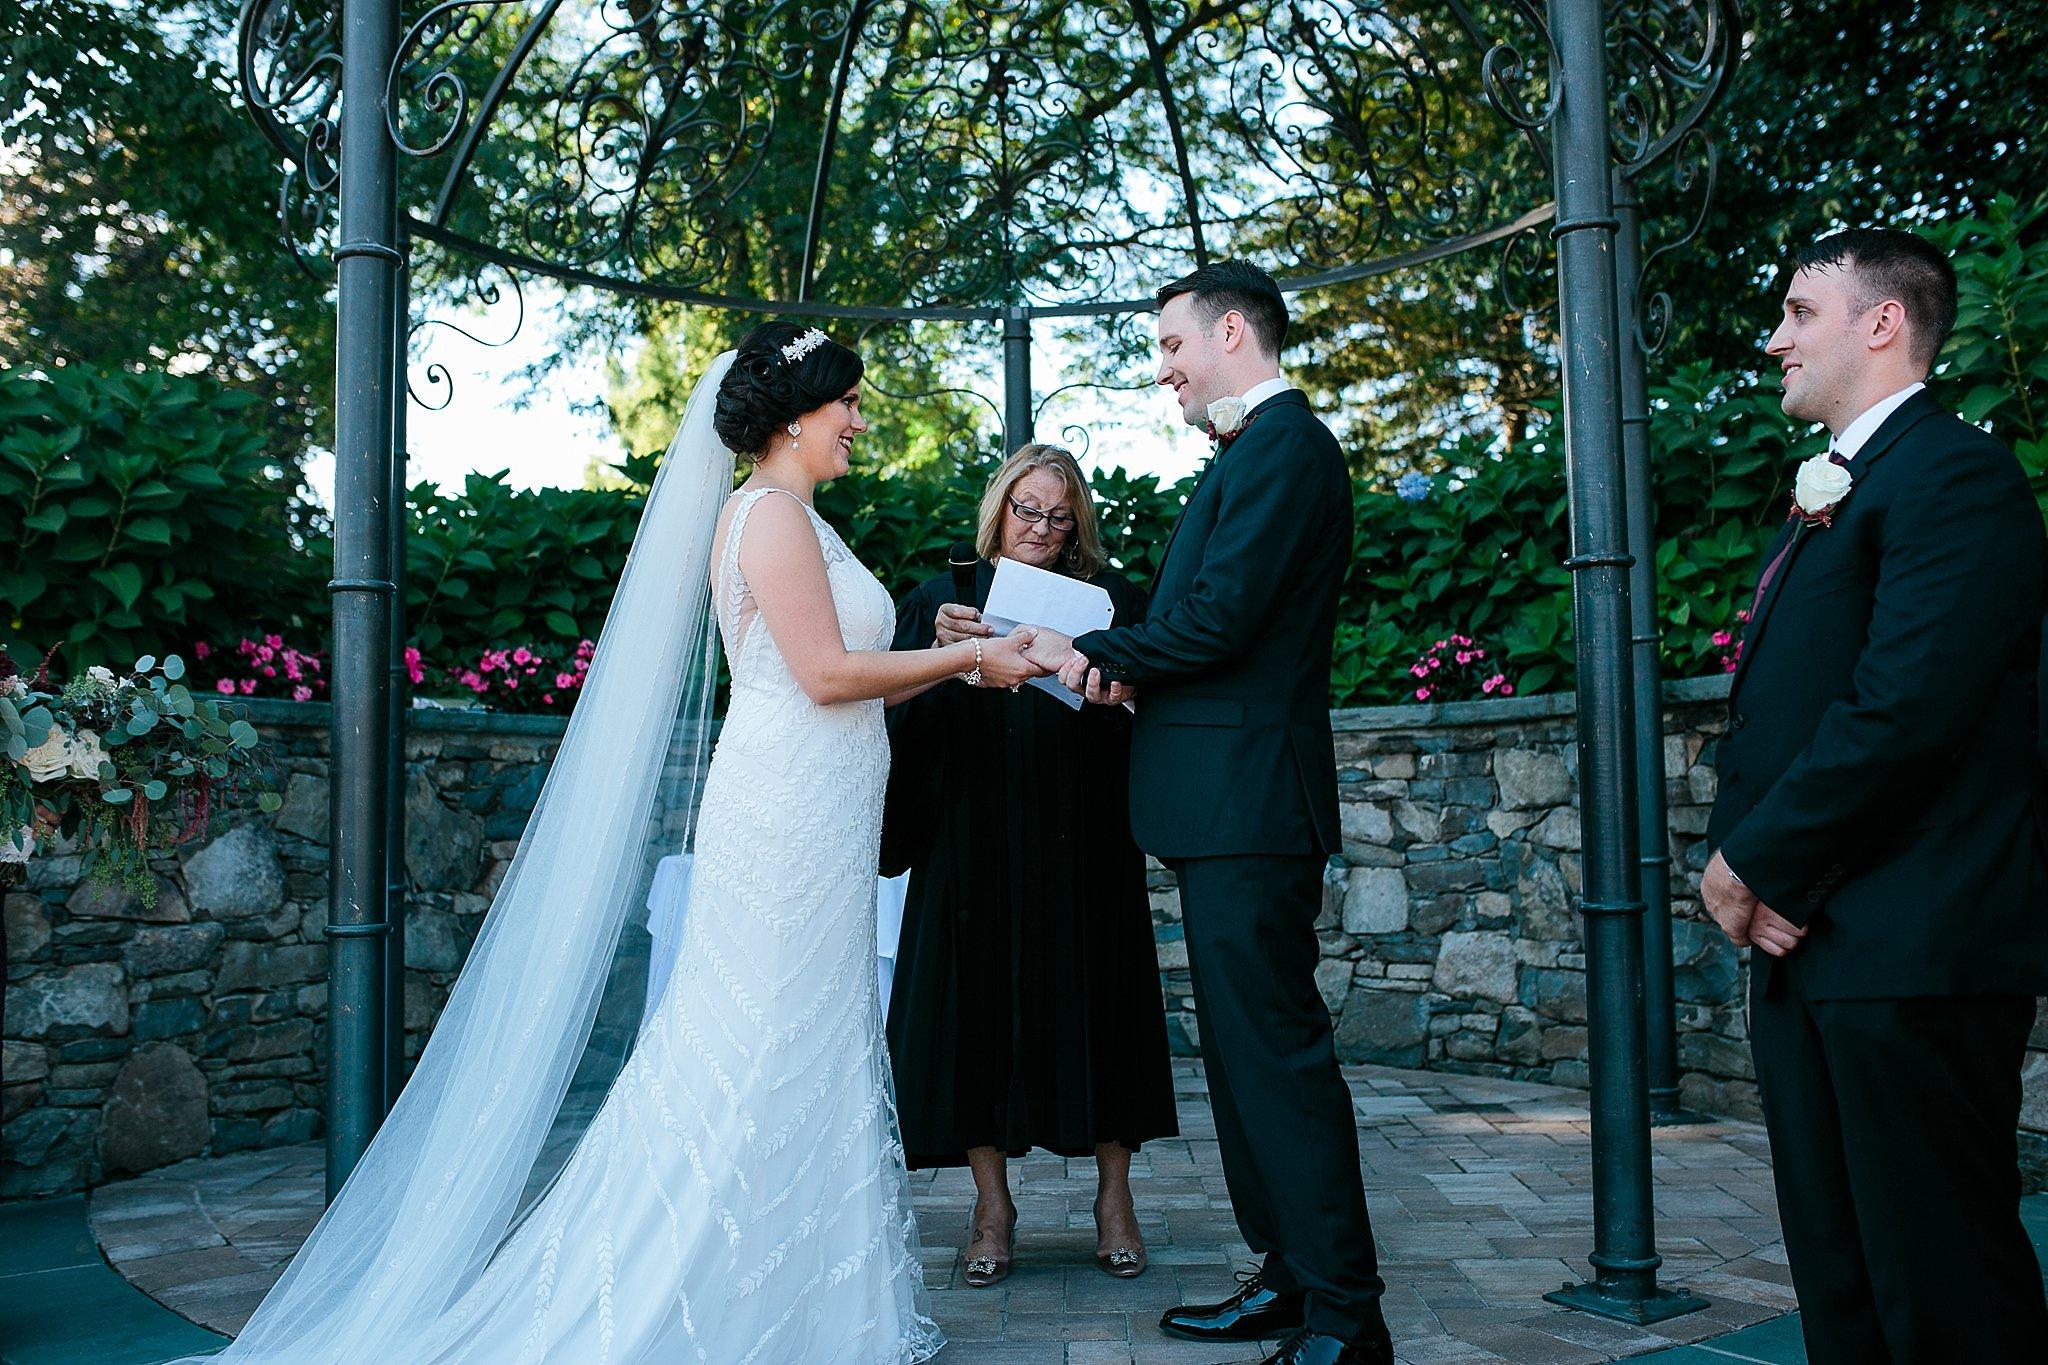 West Hills Country Club Wedding Gatsby Wedding Roaring Twenties Wedding Hudson Valley Wedding Photographer Sweet Alice Photography54.jpg